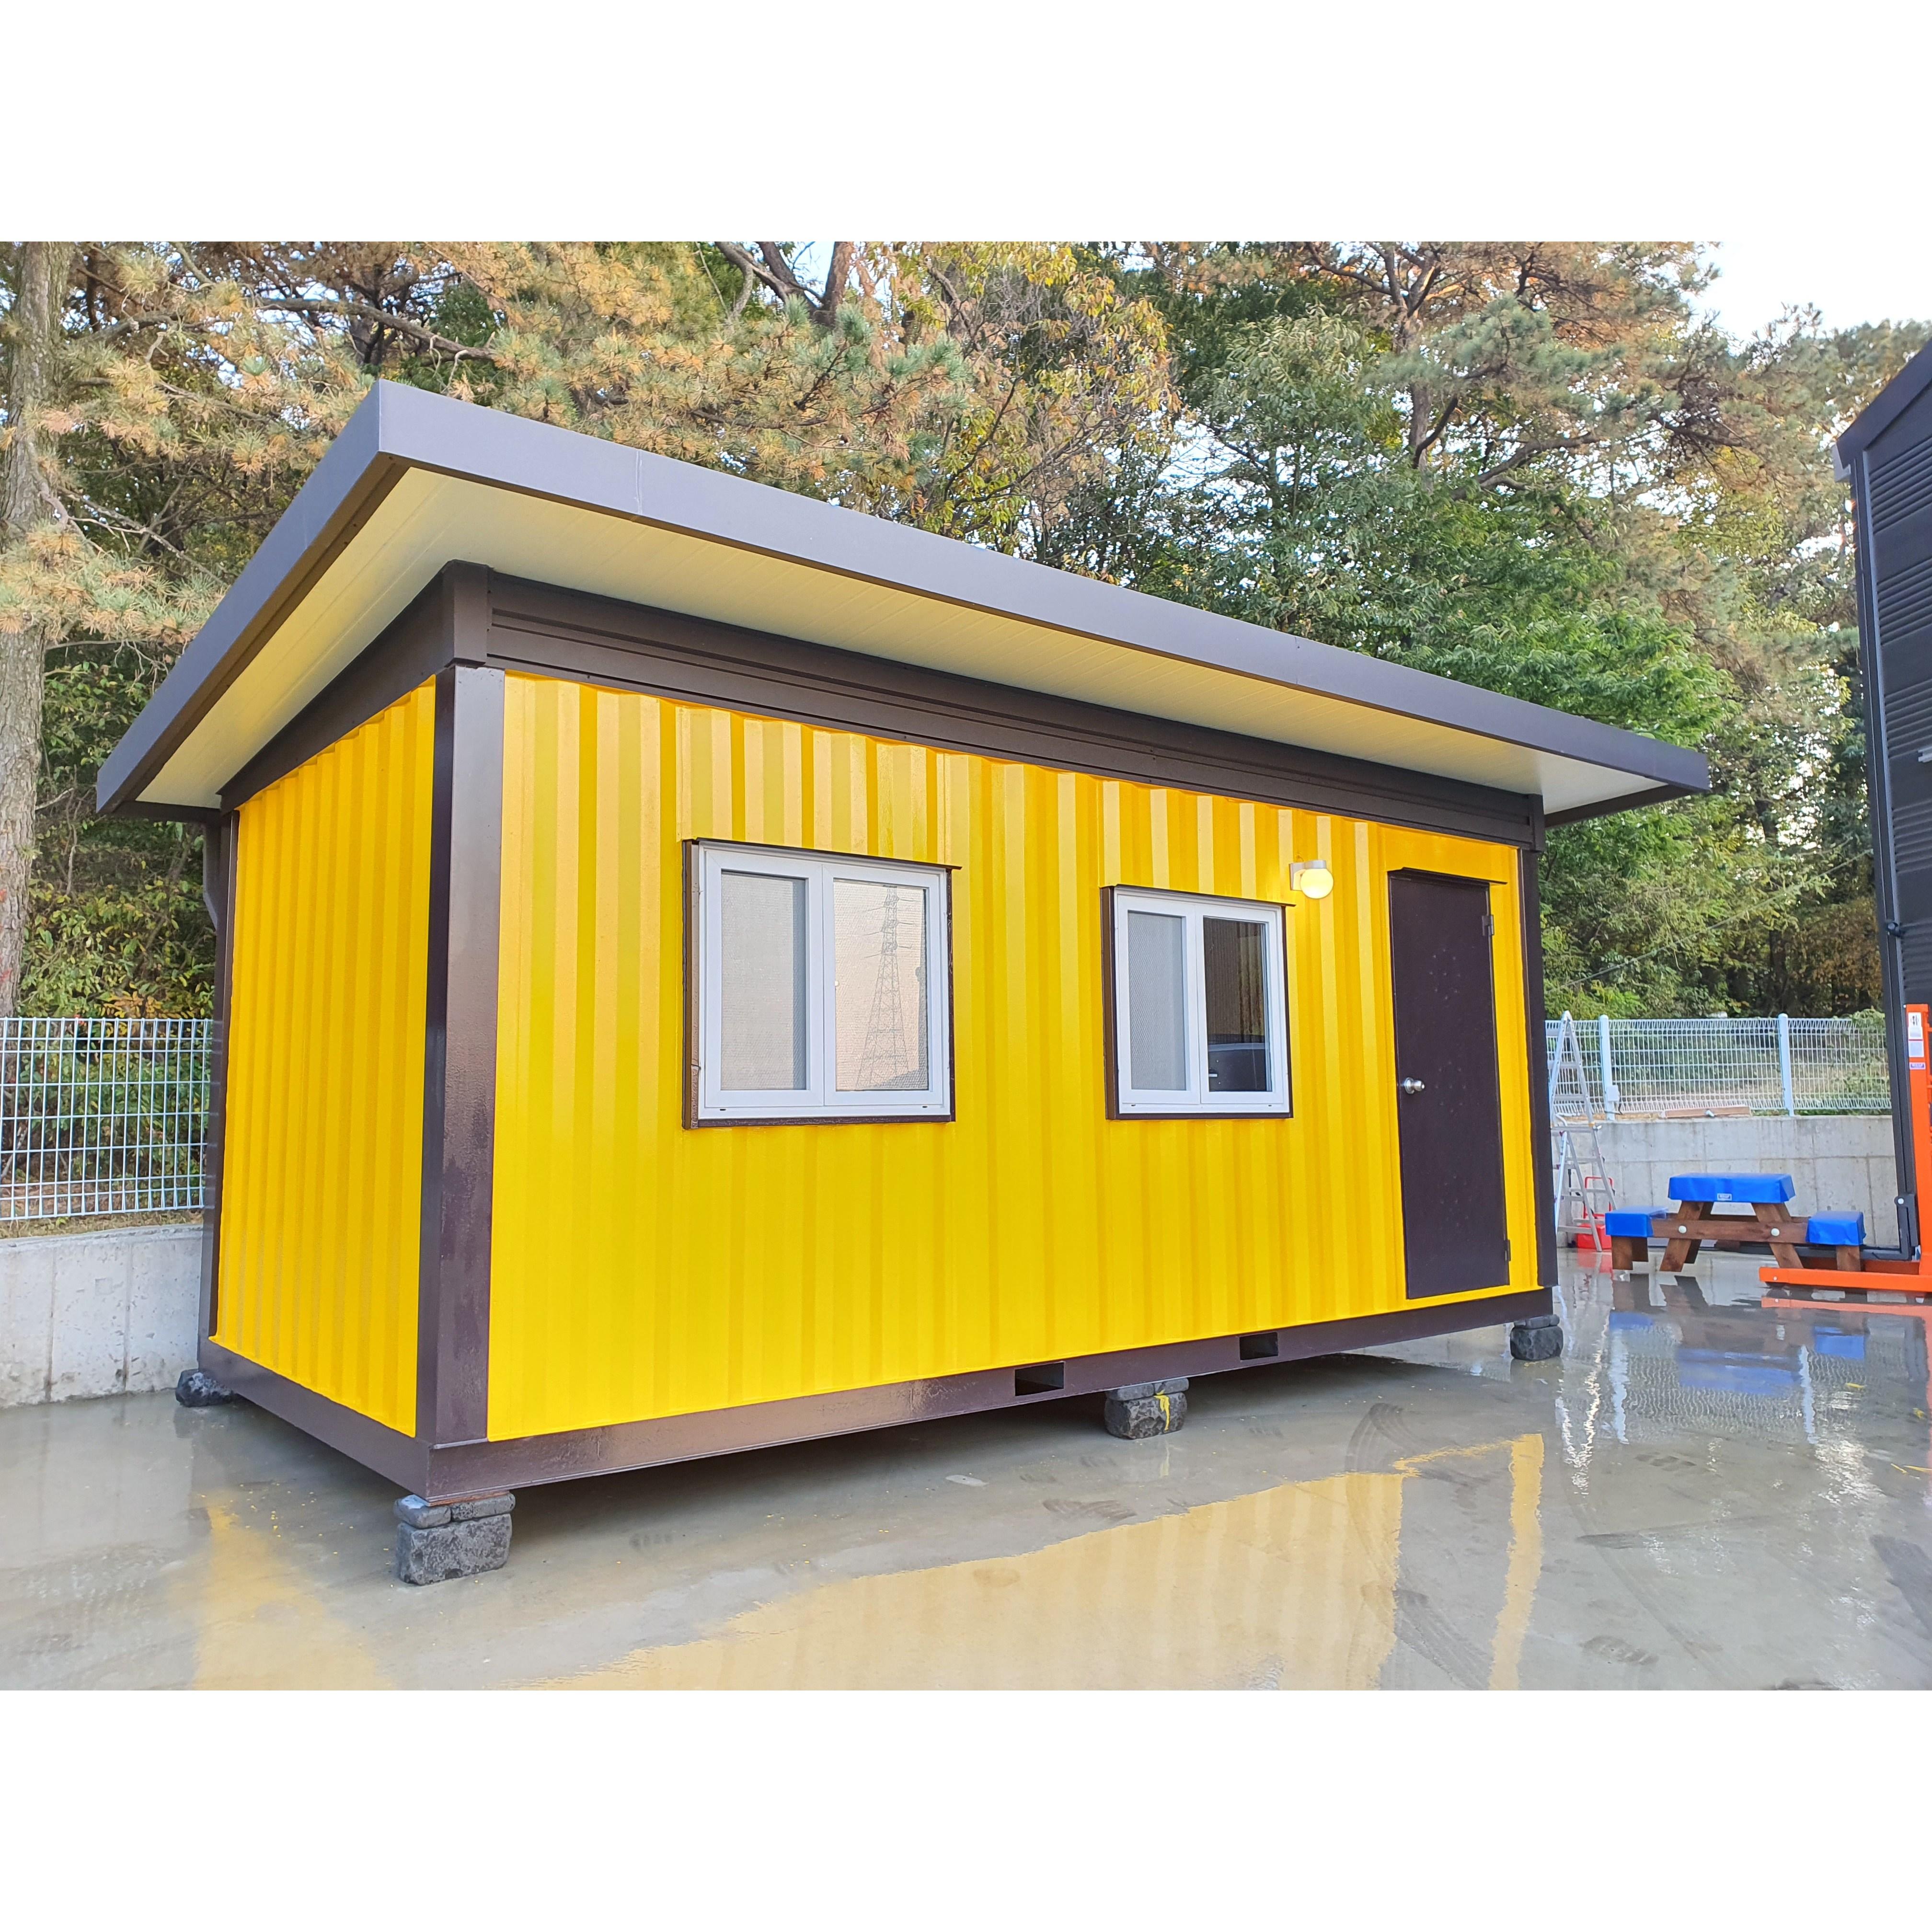 3x6컨테이너 하우스 이동식 농막 주택 사무실 창고 지붕 시공 (지붕만)